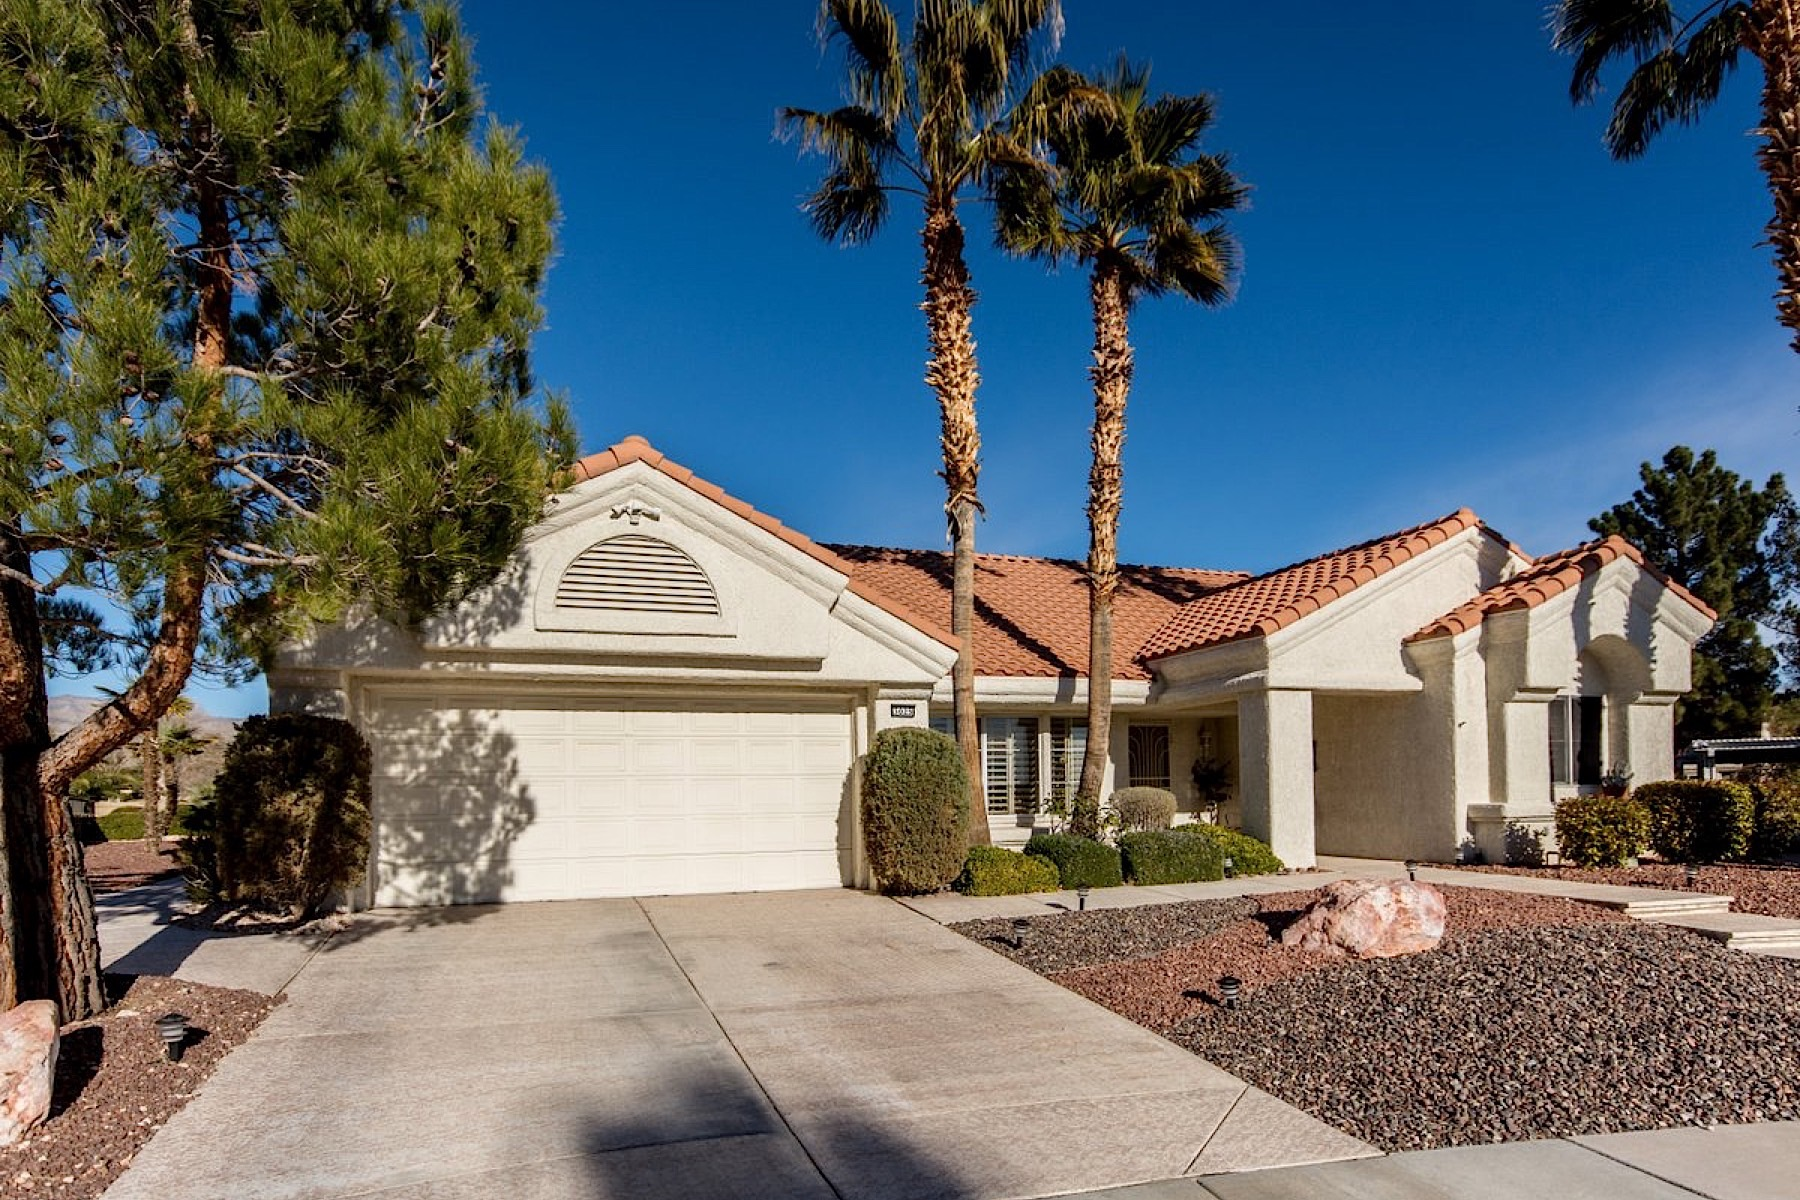 Property For Sale at 3025 Golf Links Dr